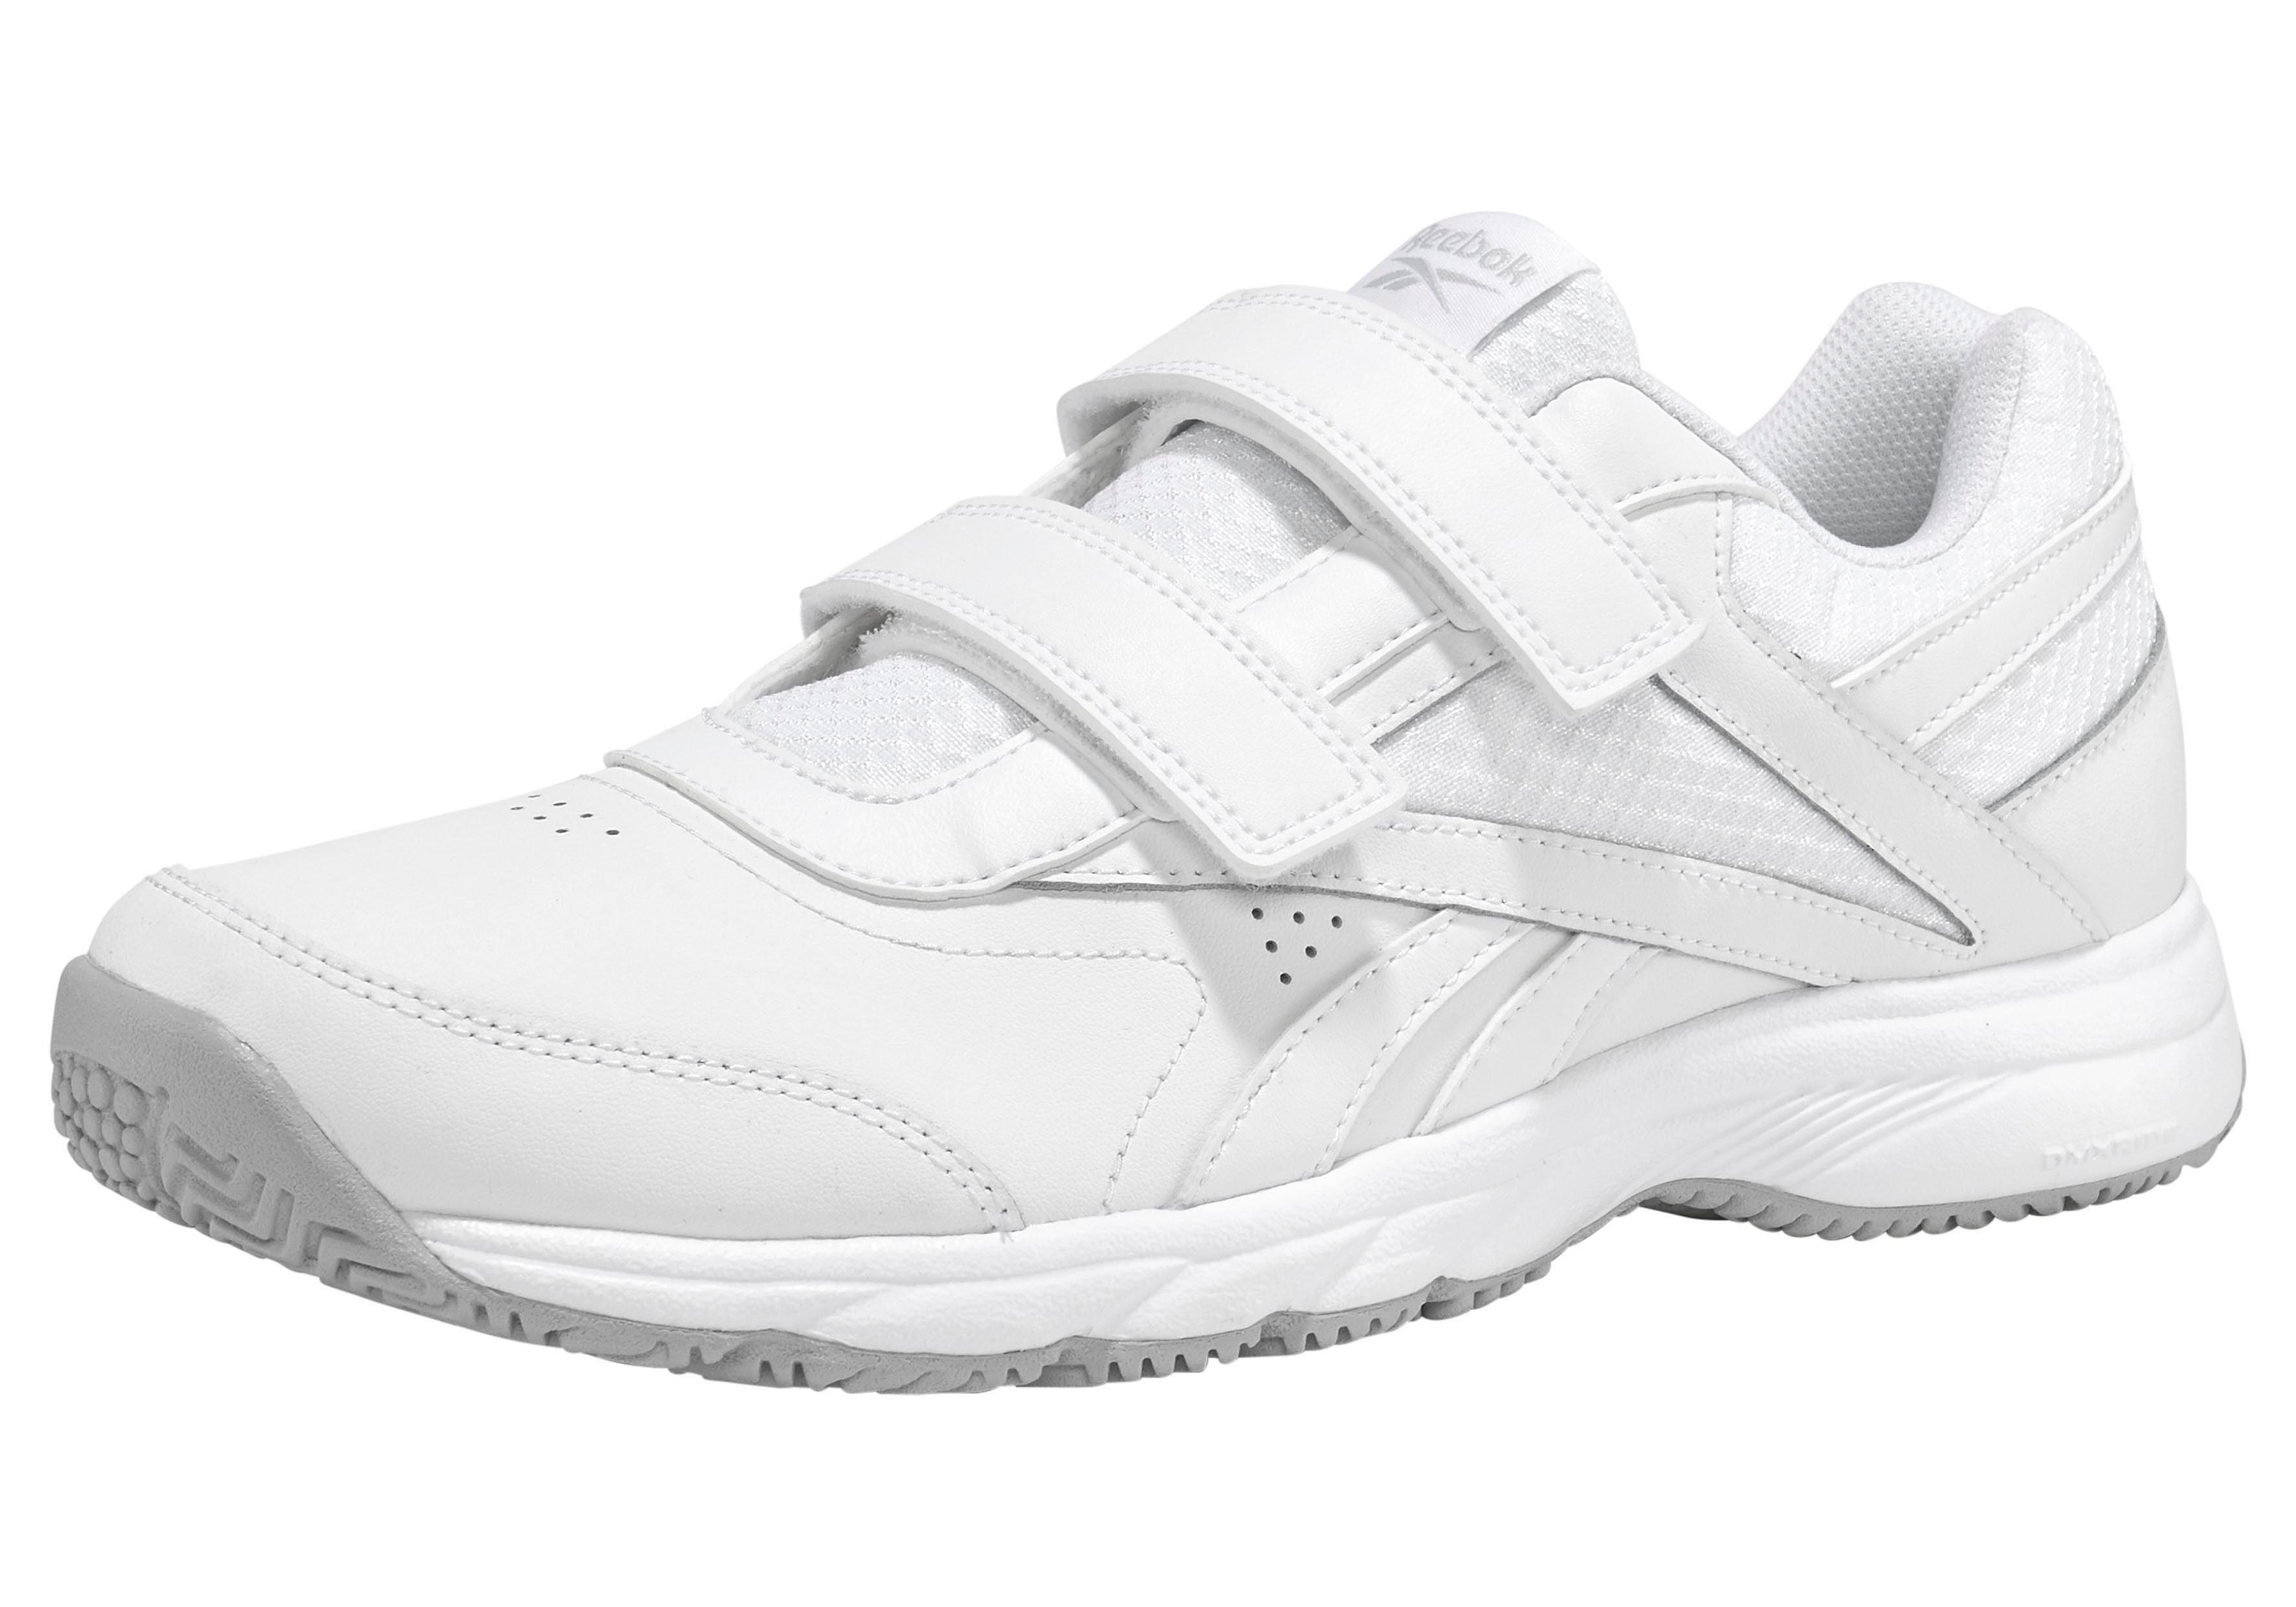 Work N Cushion 4.0 Shoes